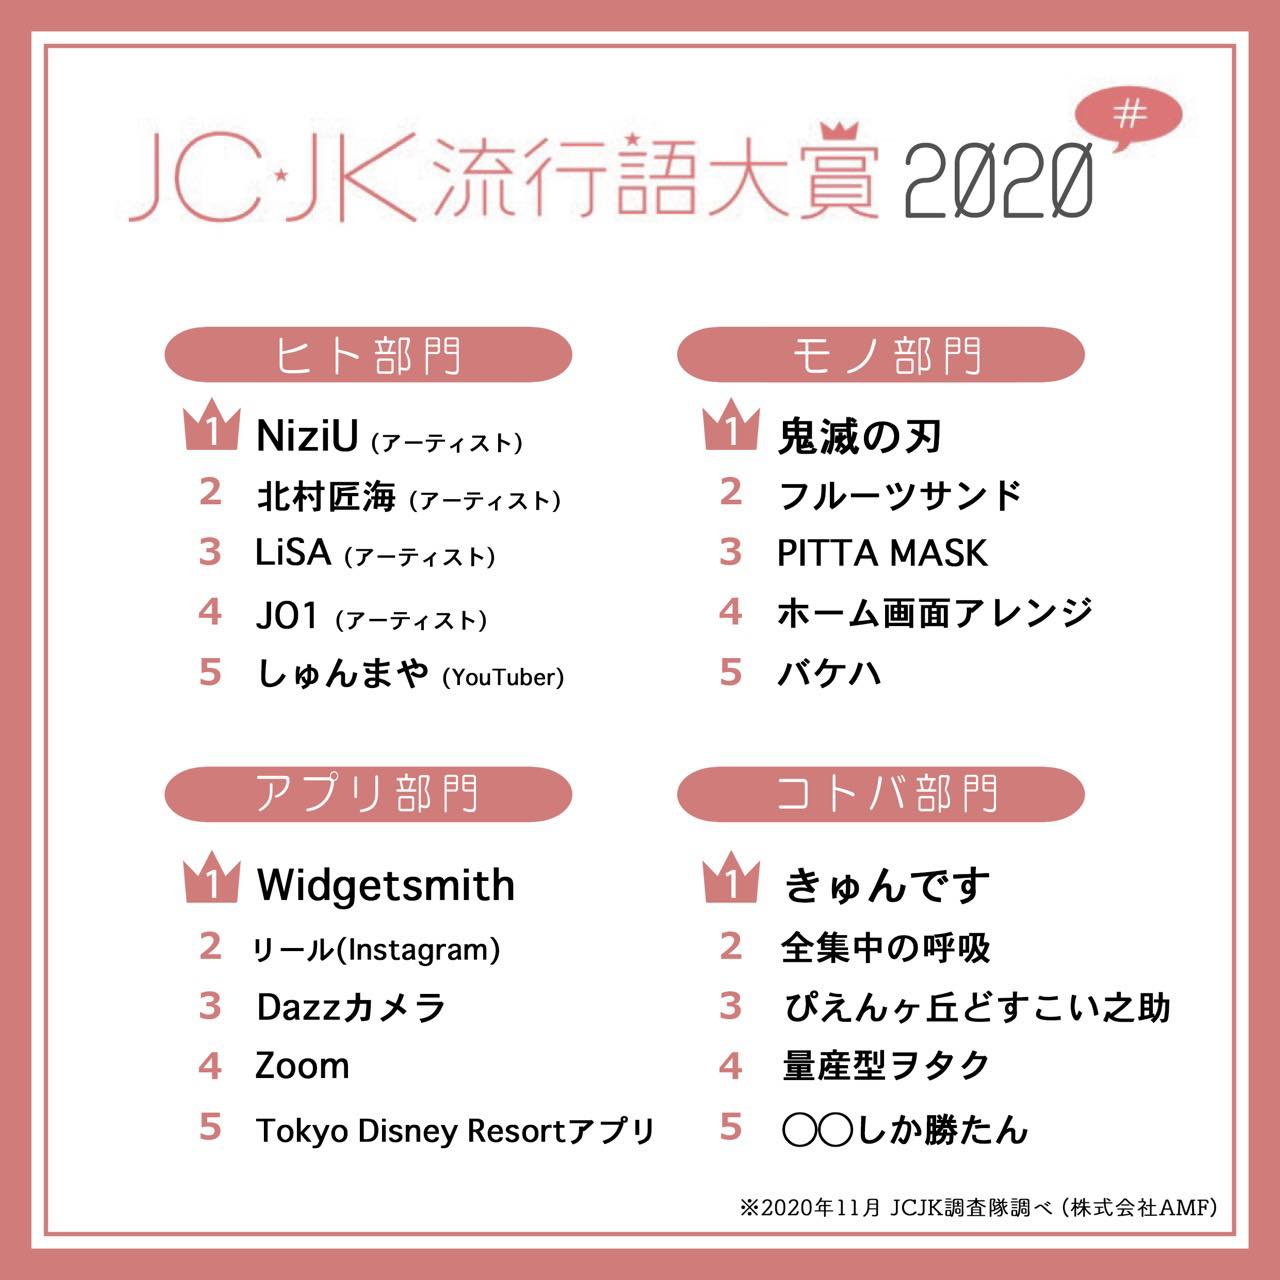 2020 jk 語